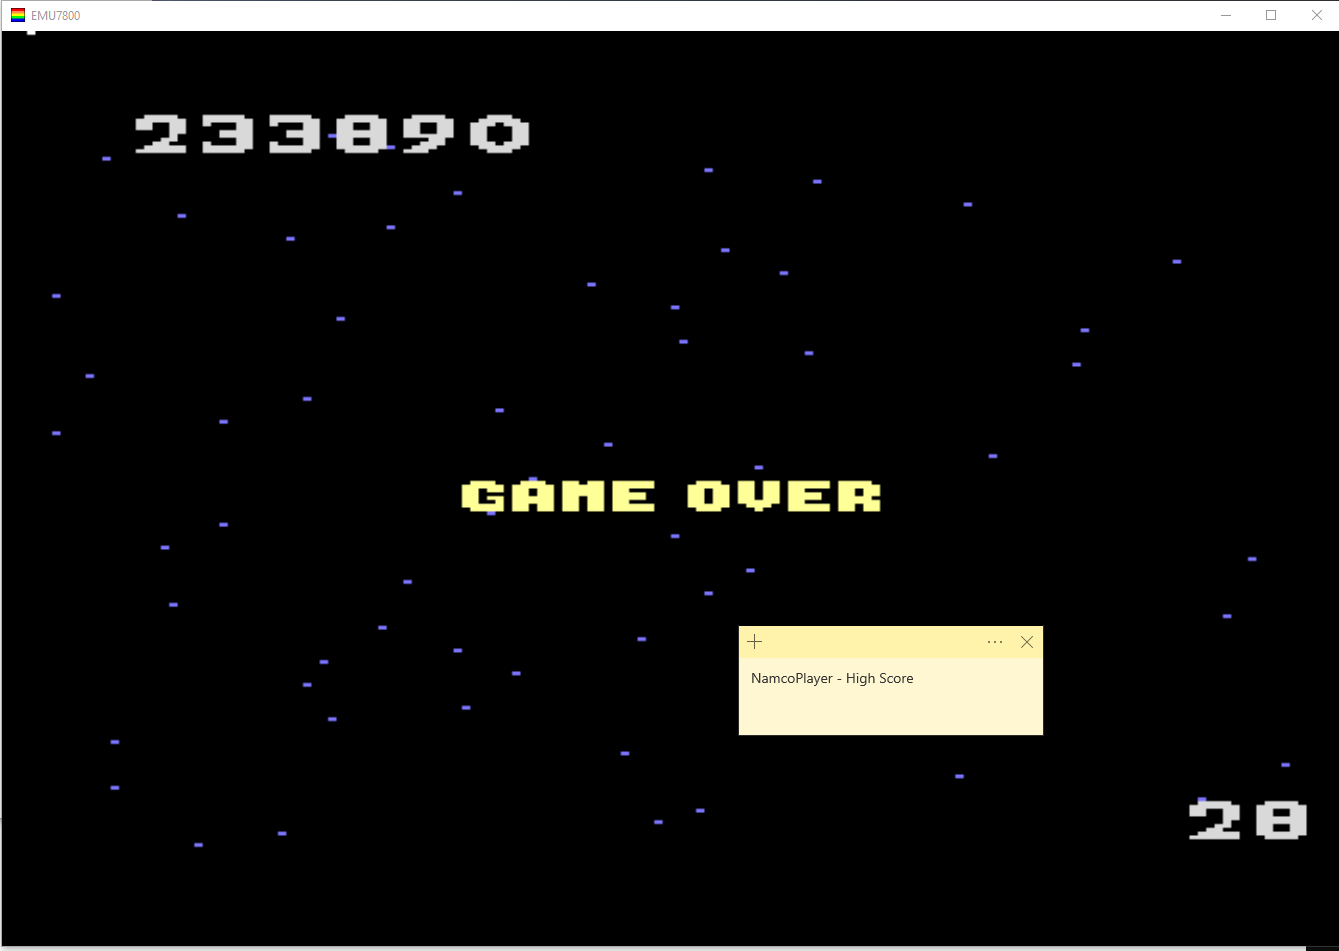 NamcoPlayer: Galaga: Advanced (Atari 7800 Emulated) 233,890 points on 2020-11-05 13:47:48